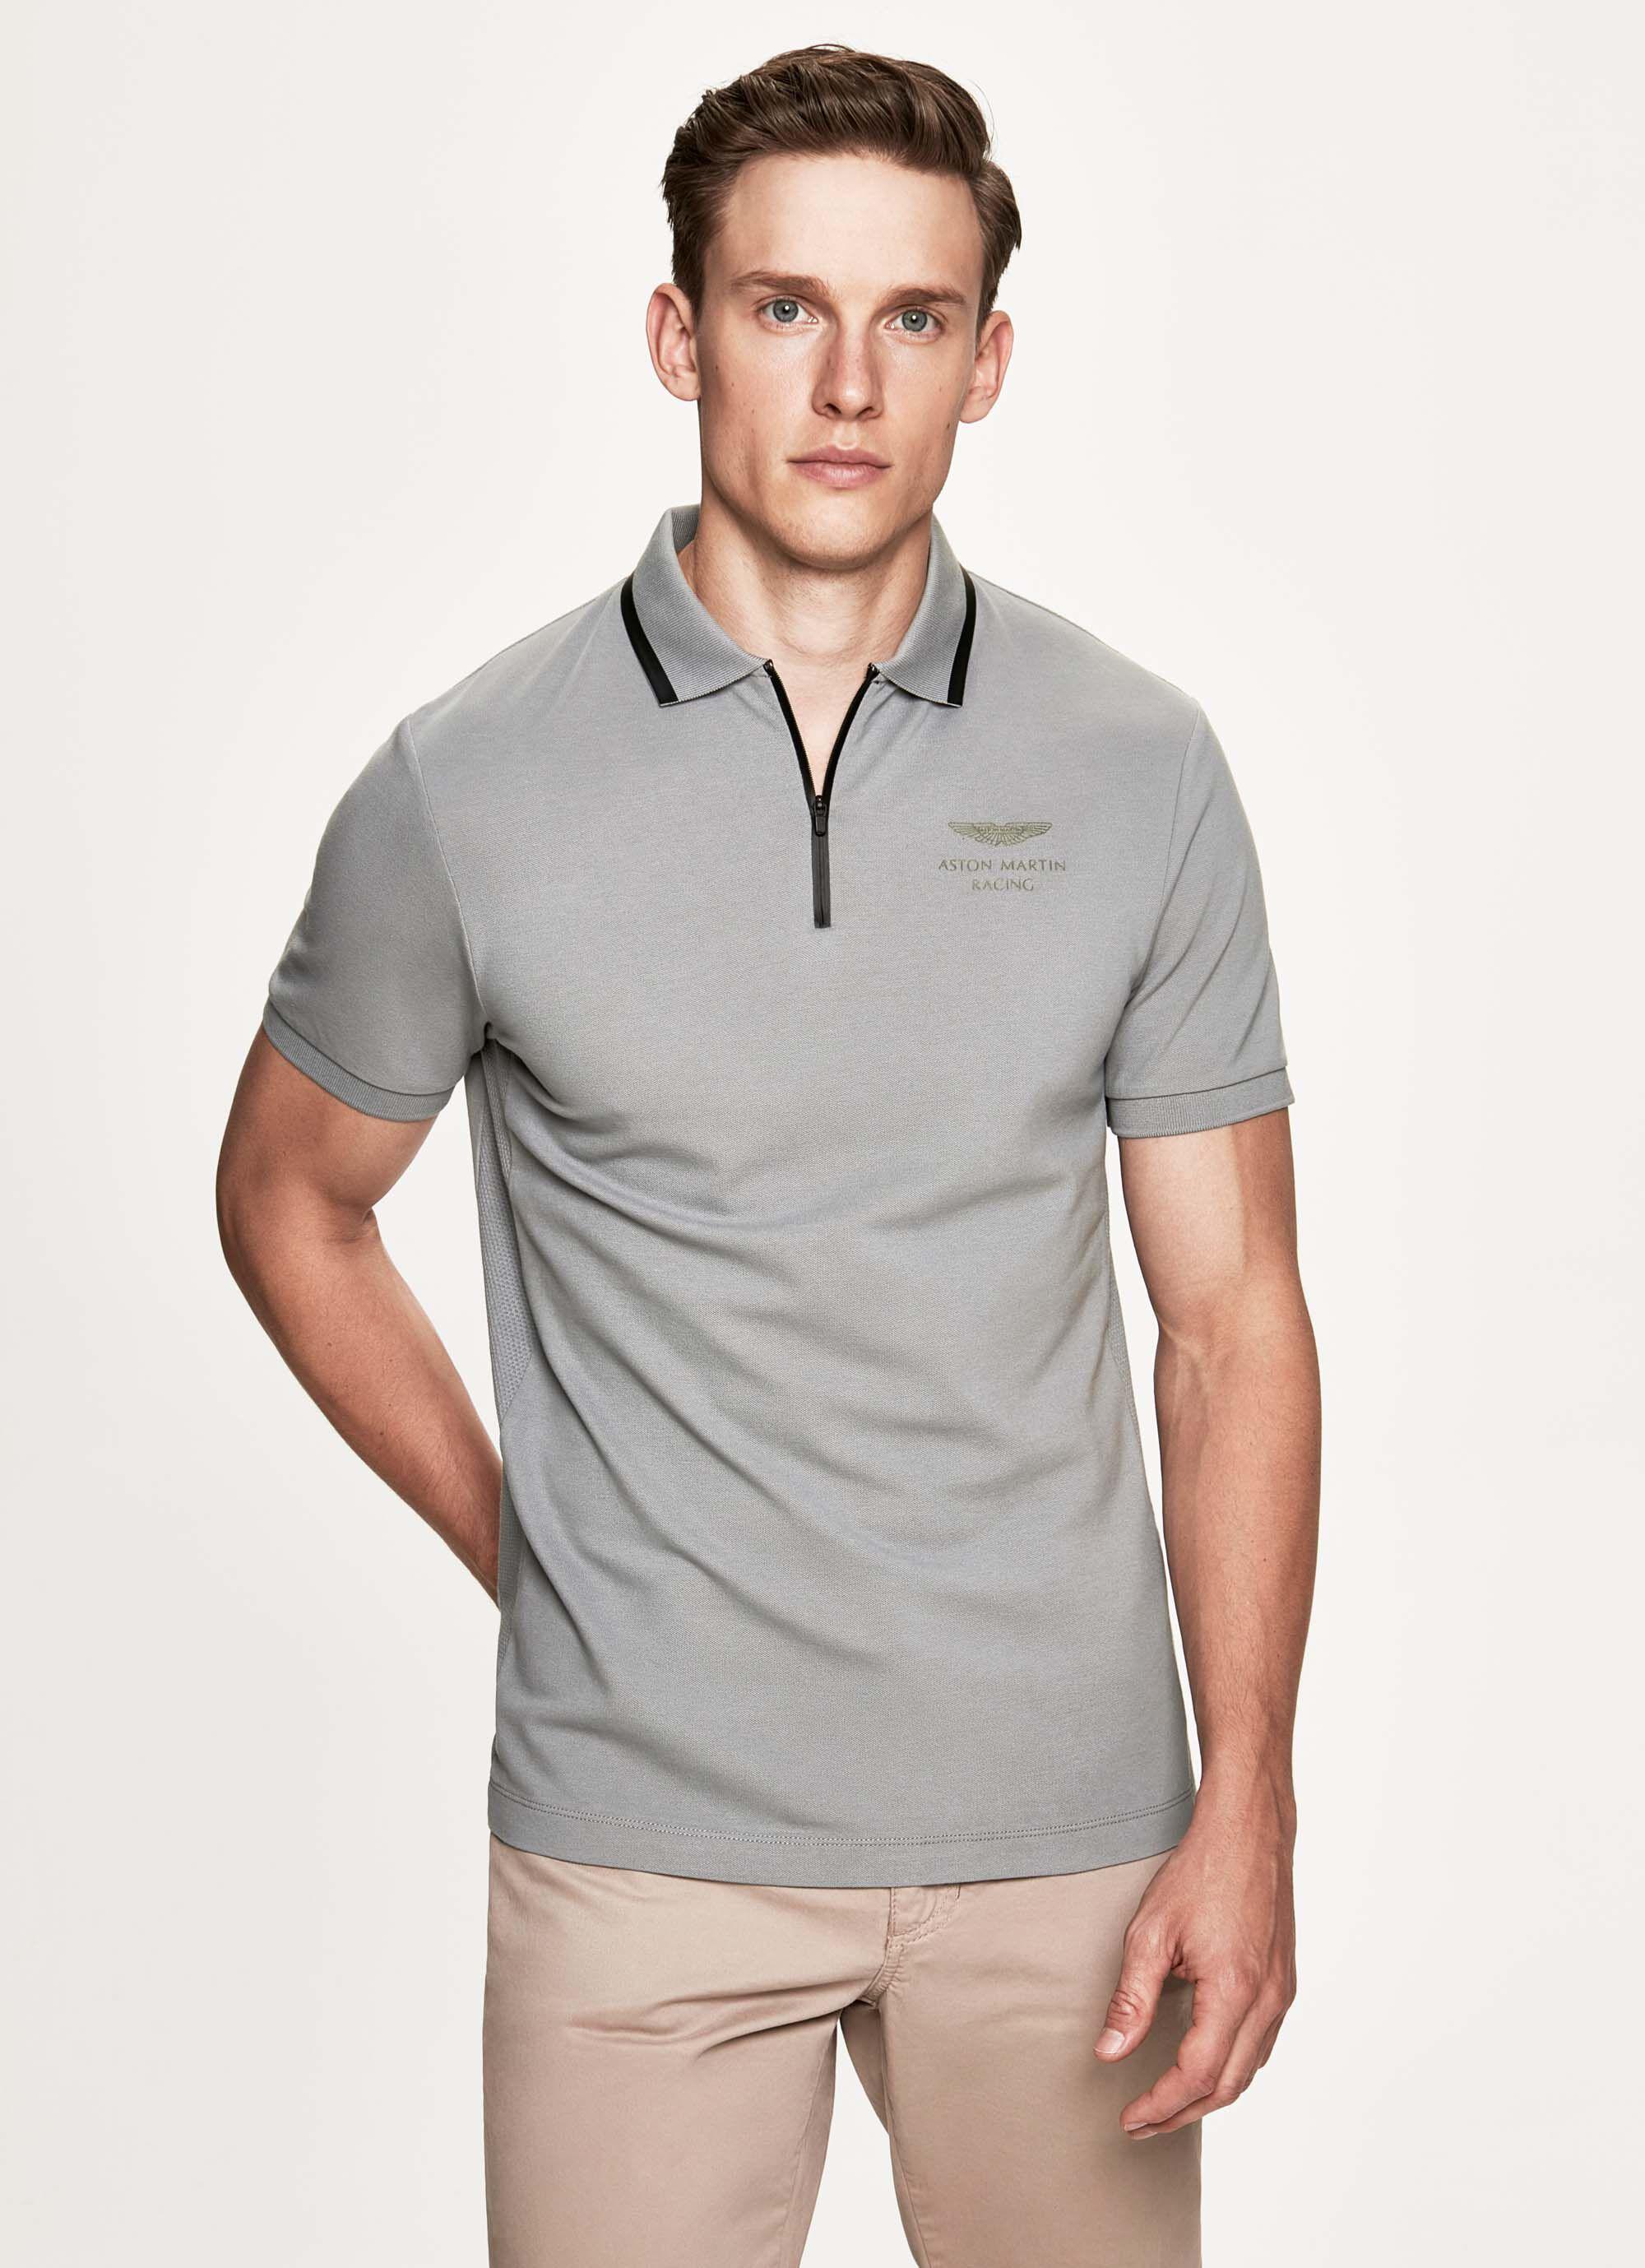 aston martin racing pro men's stretch cotton half zip short-sleeved polo shirt | small | grey